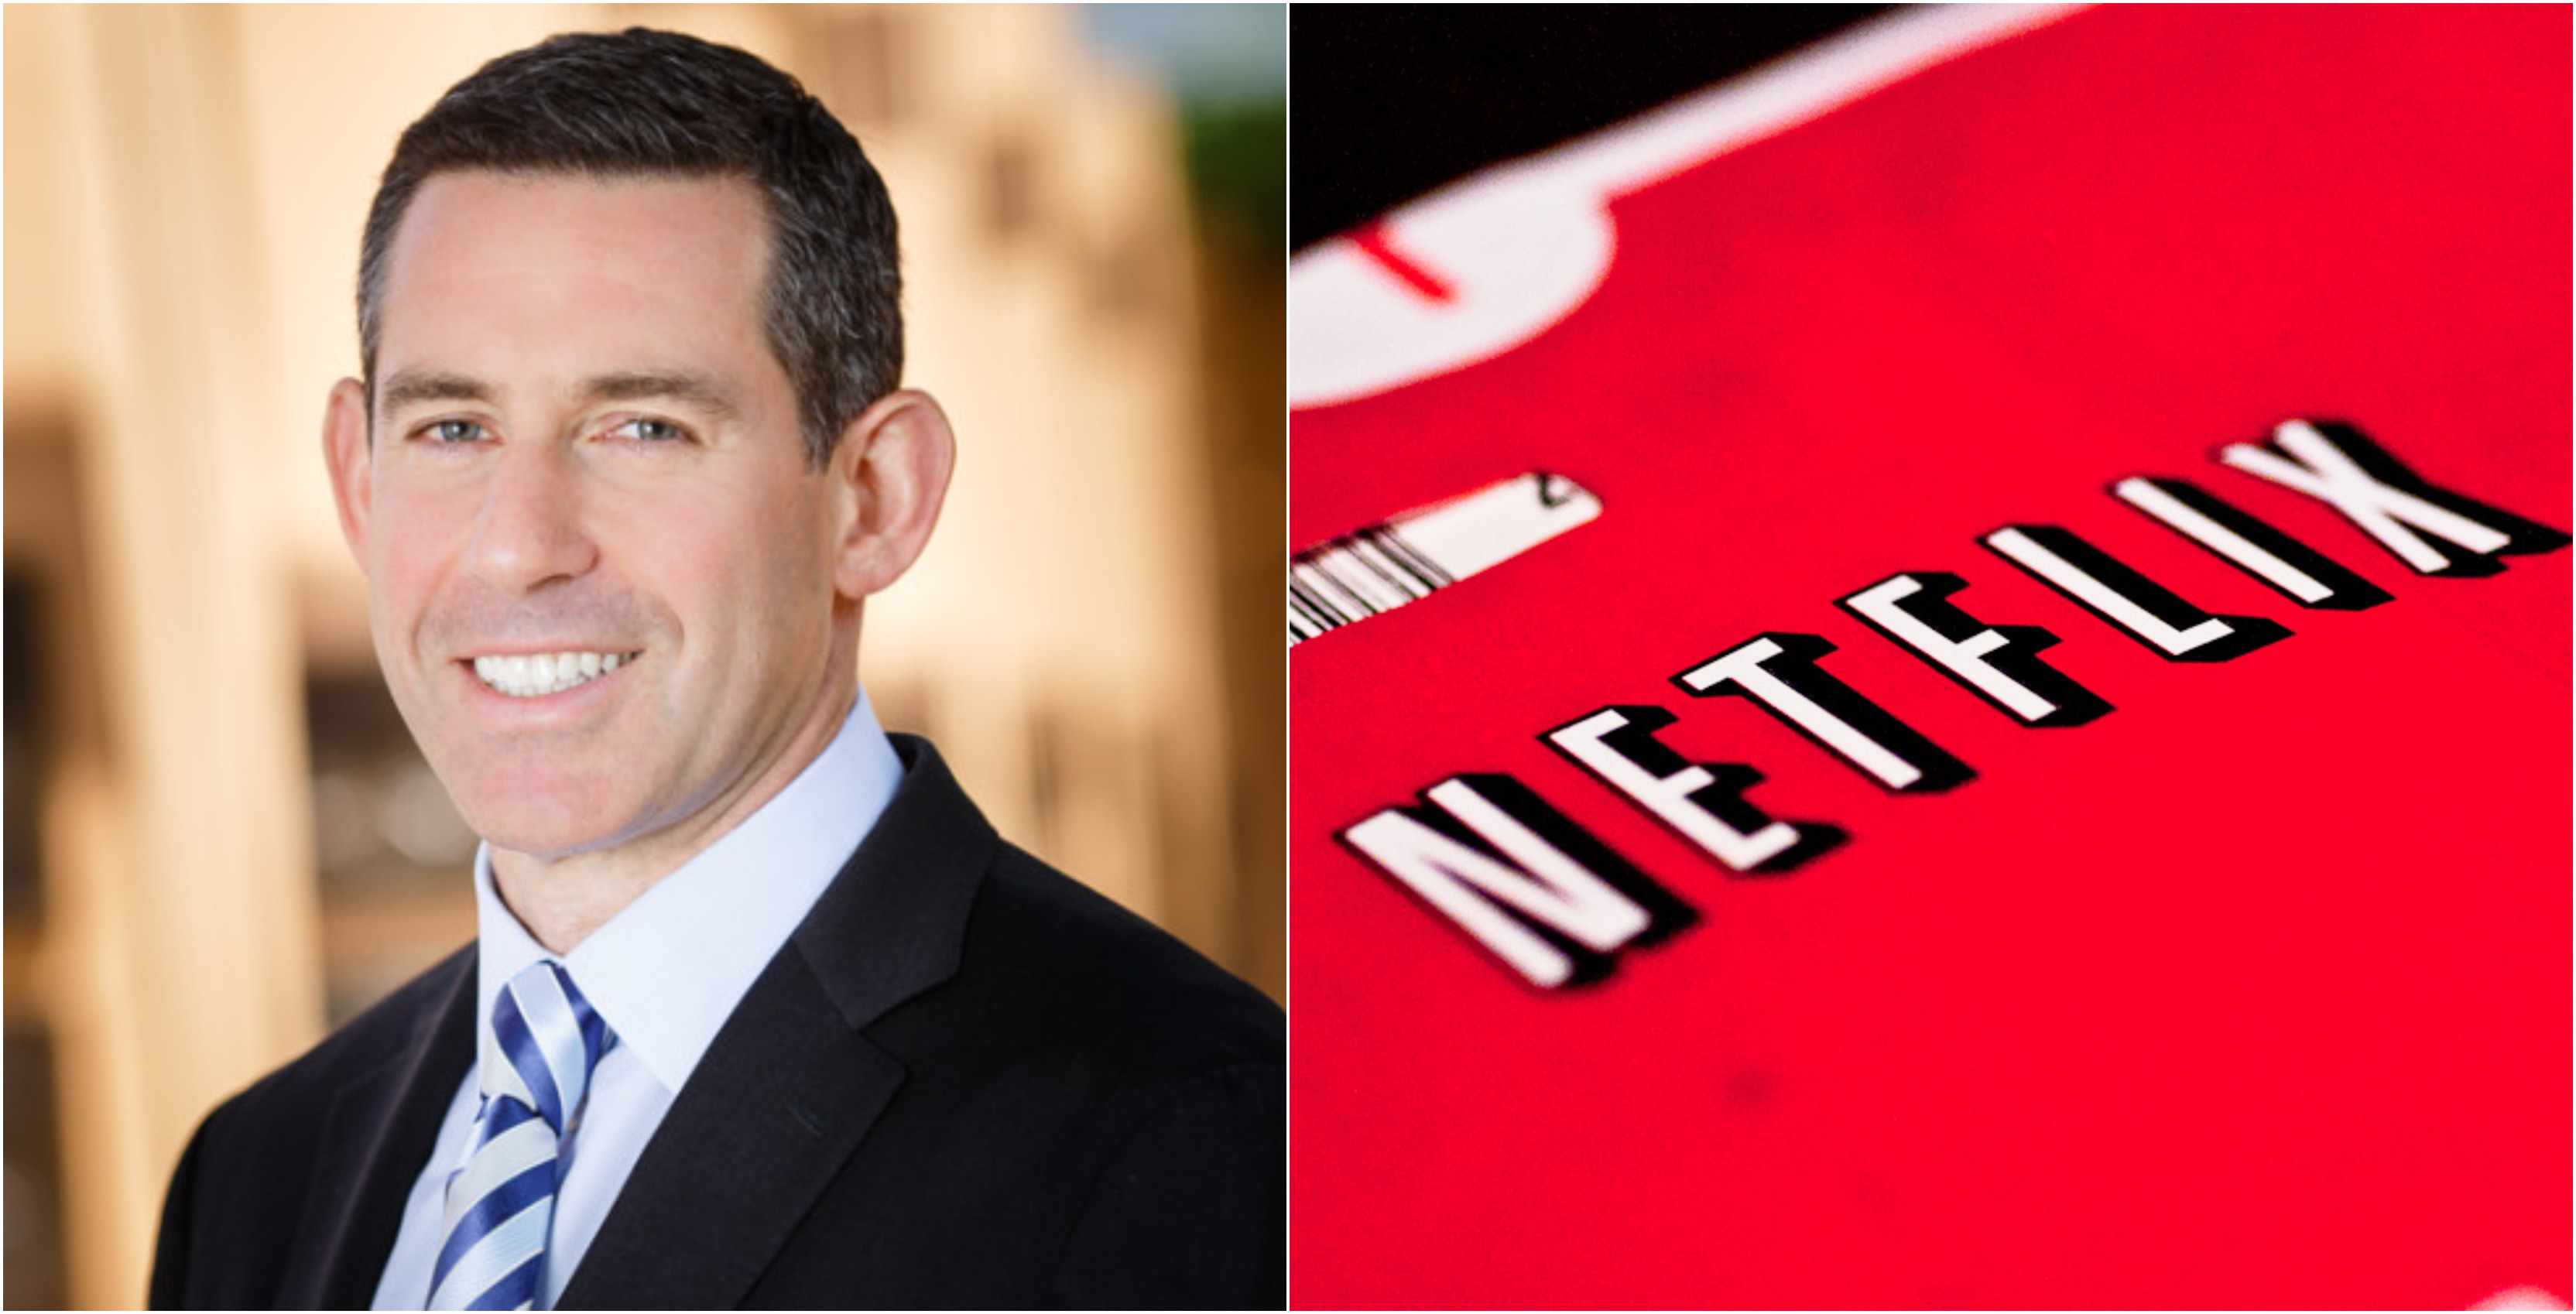 Netflix names former gaming company exec Spencer Neumann as CFO